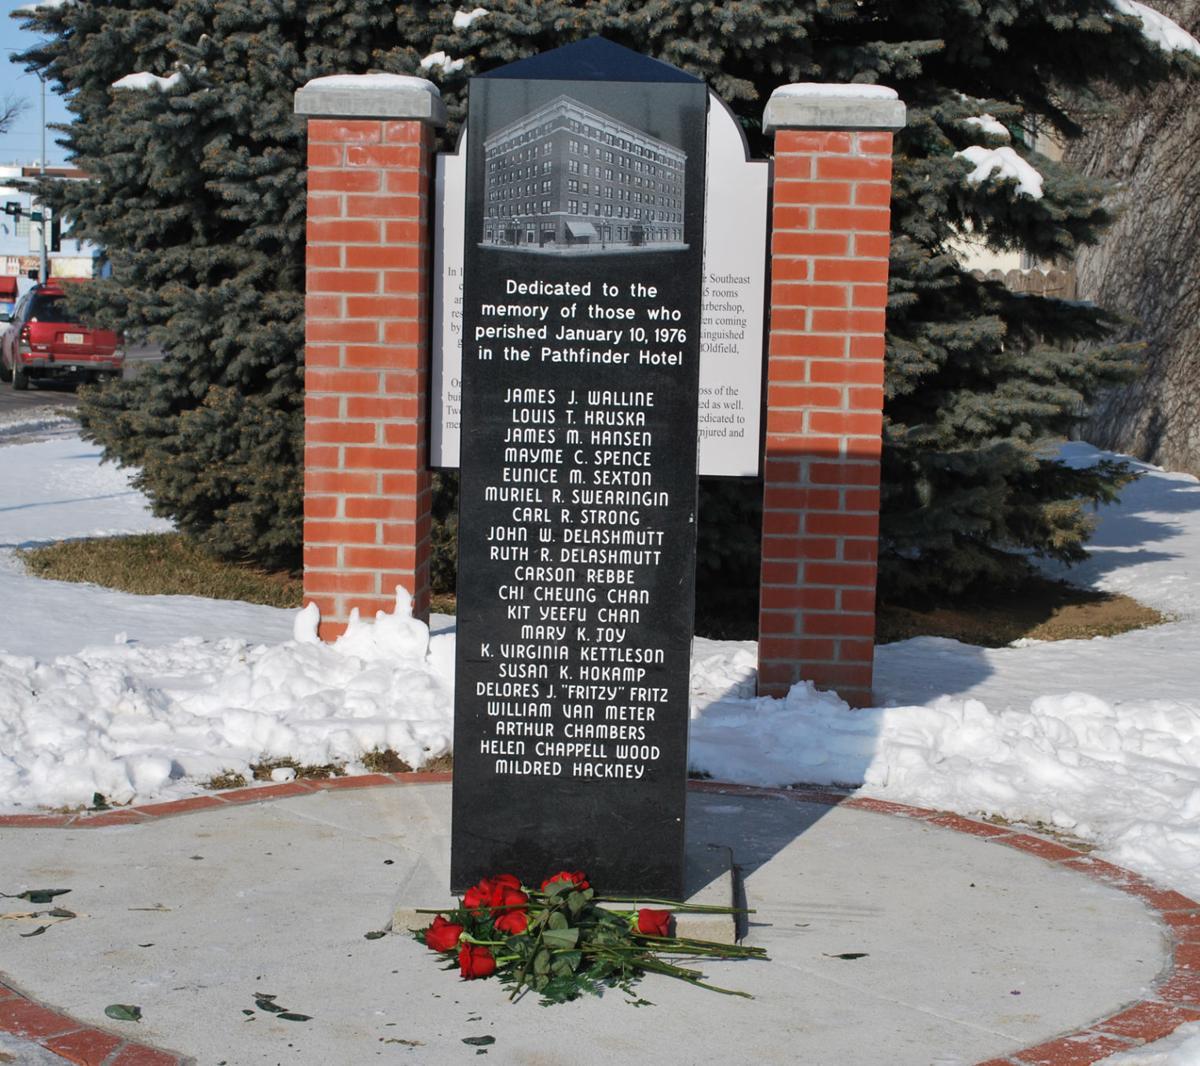 Pathfinder Hotel memorial